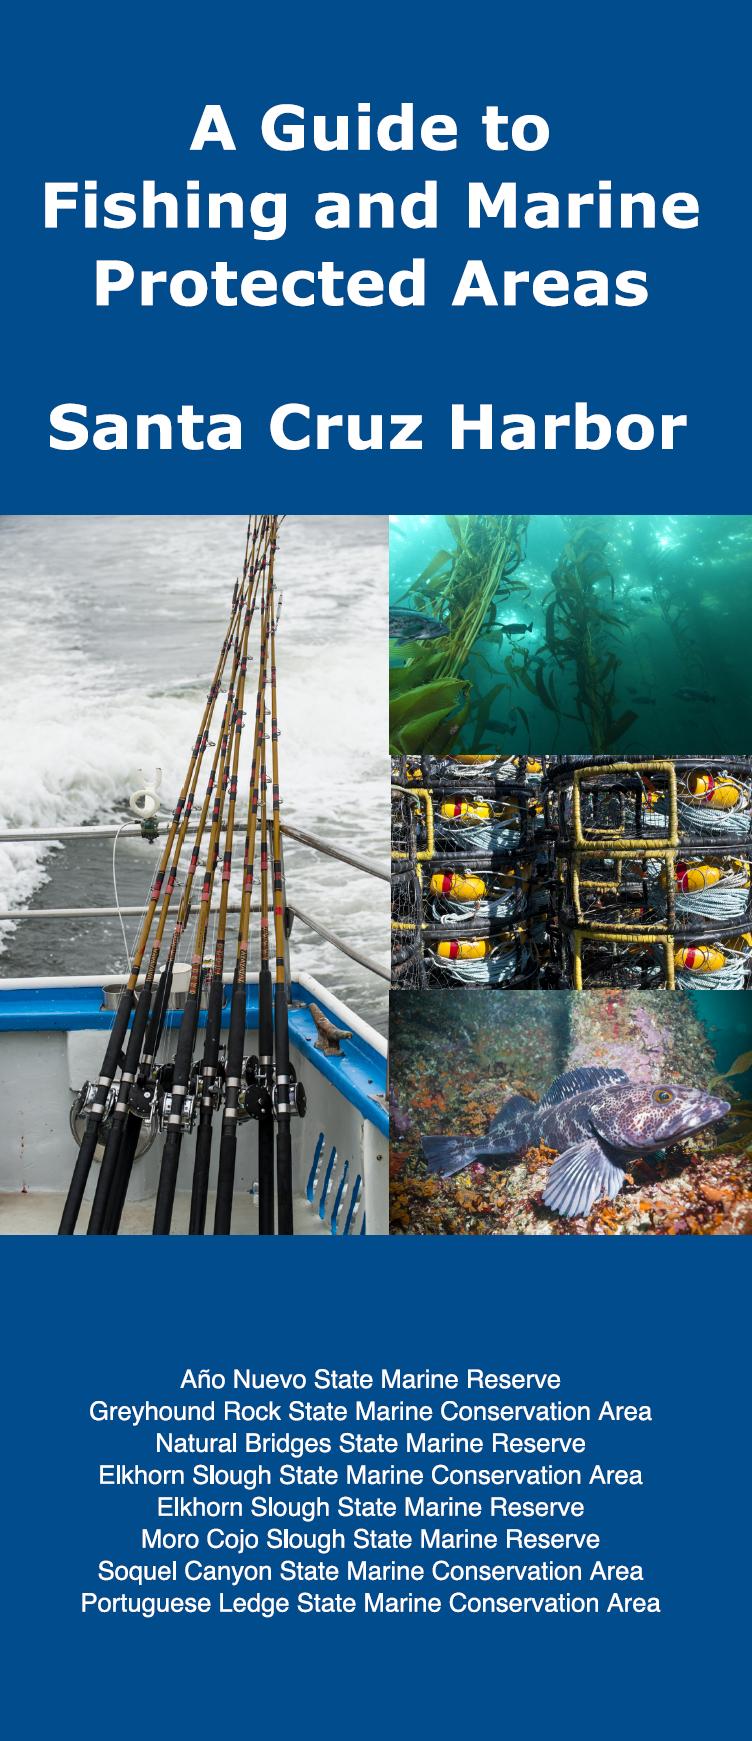 Fishing and MPAs Guide: Santa Cruz Harbor